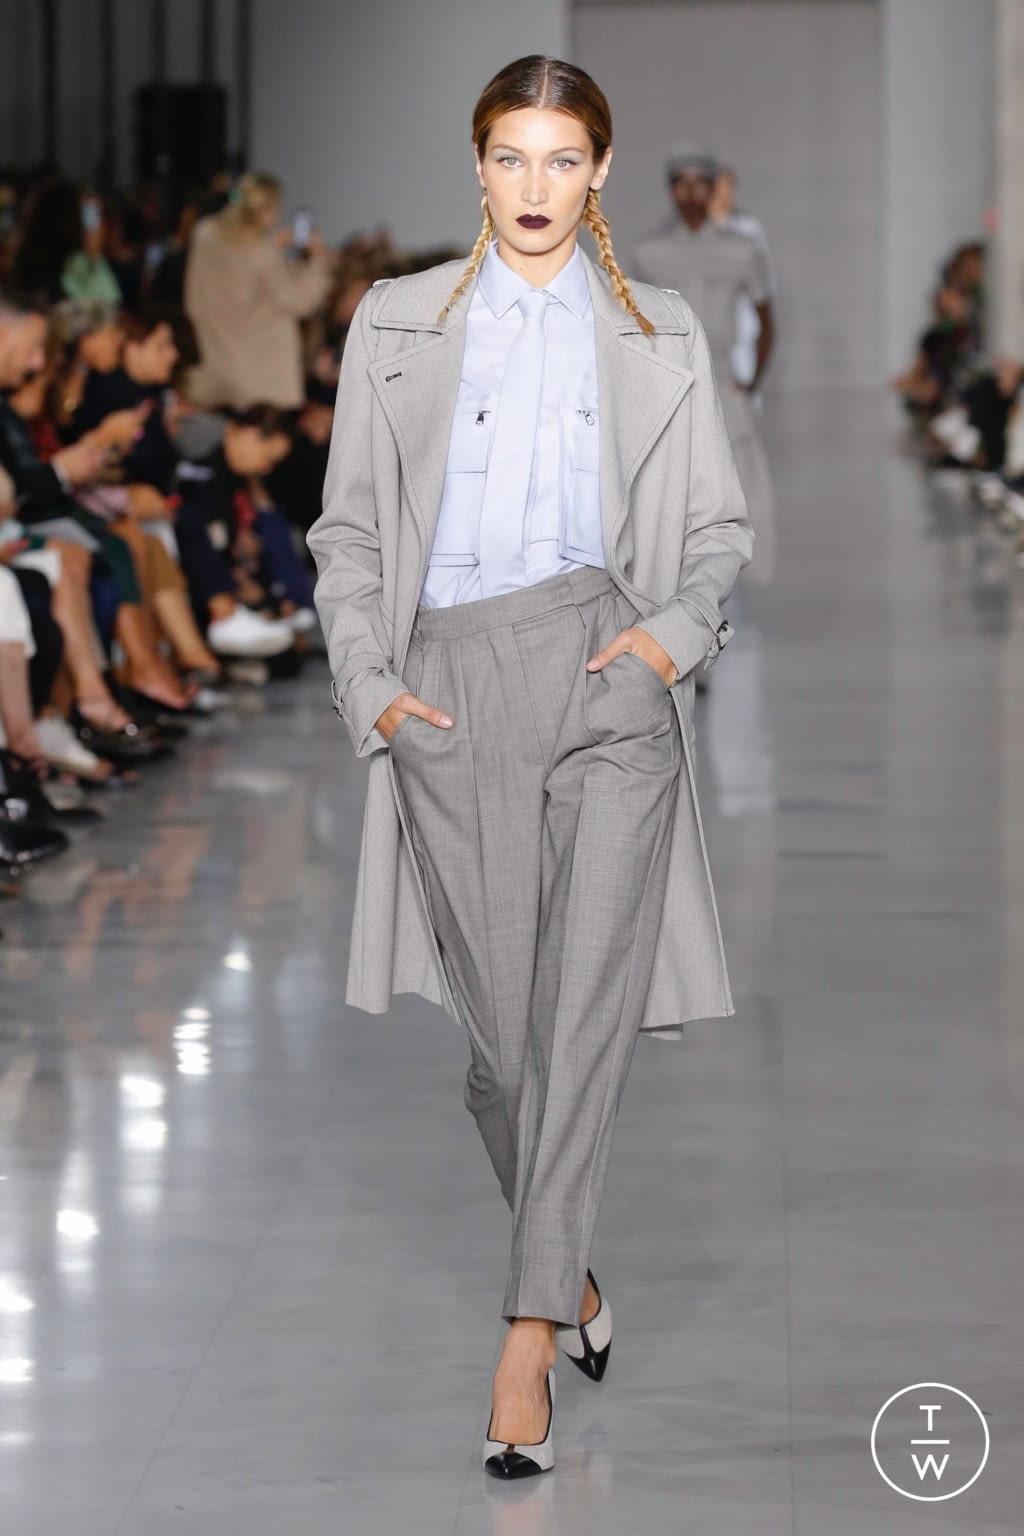 Max Mara Ss20 Womenswear 5 The Fashion Search Engine Tagwalk